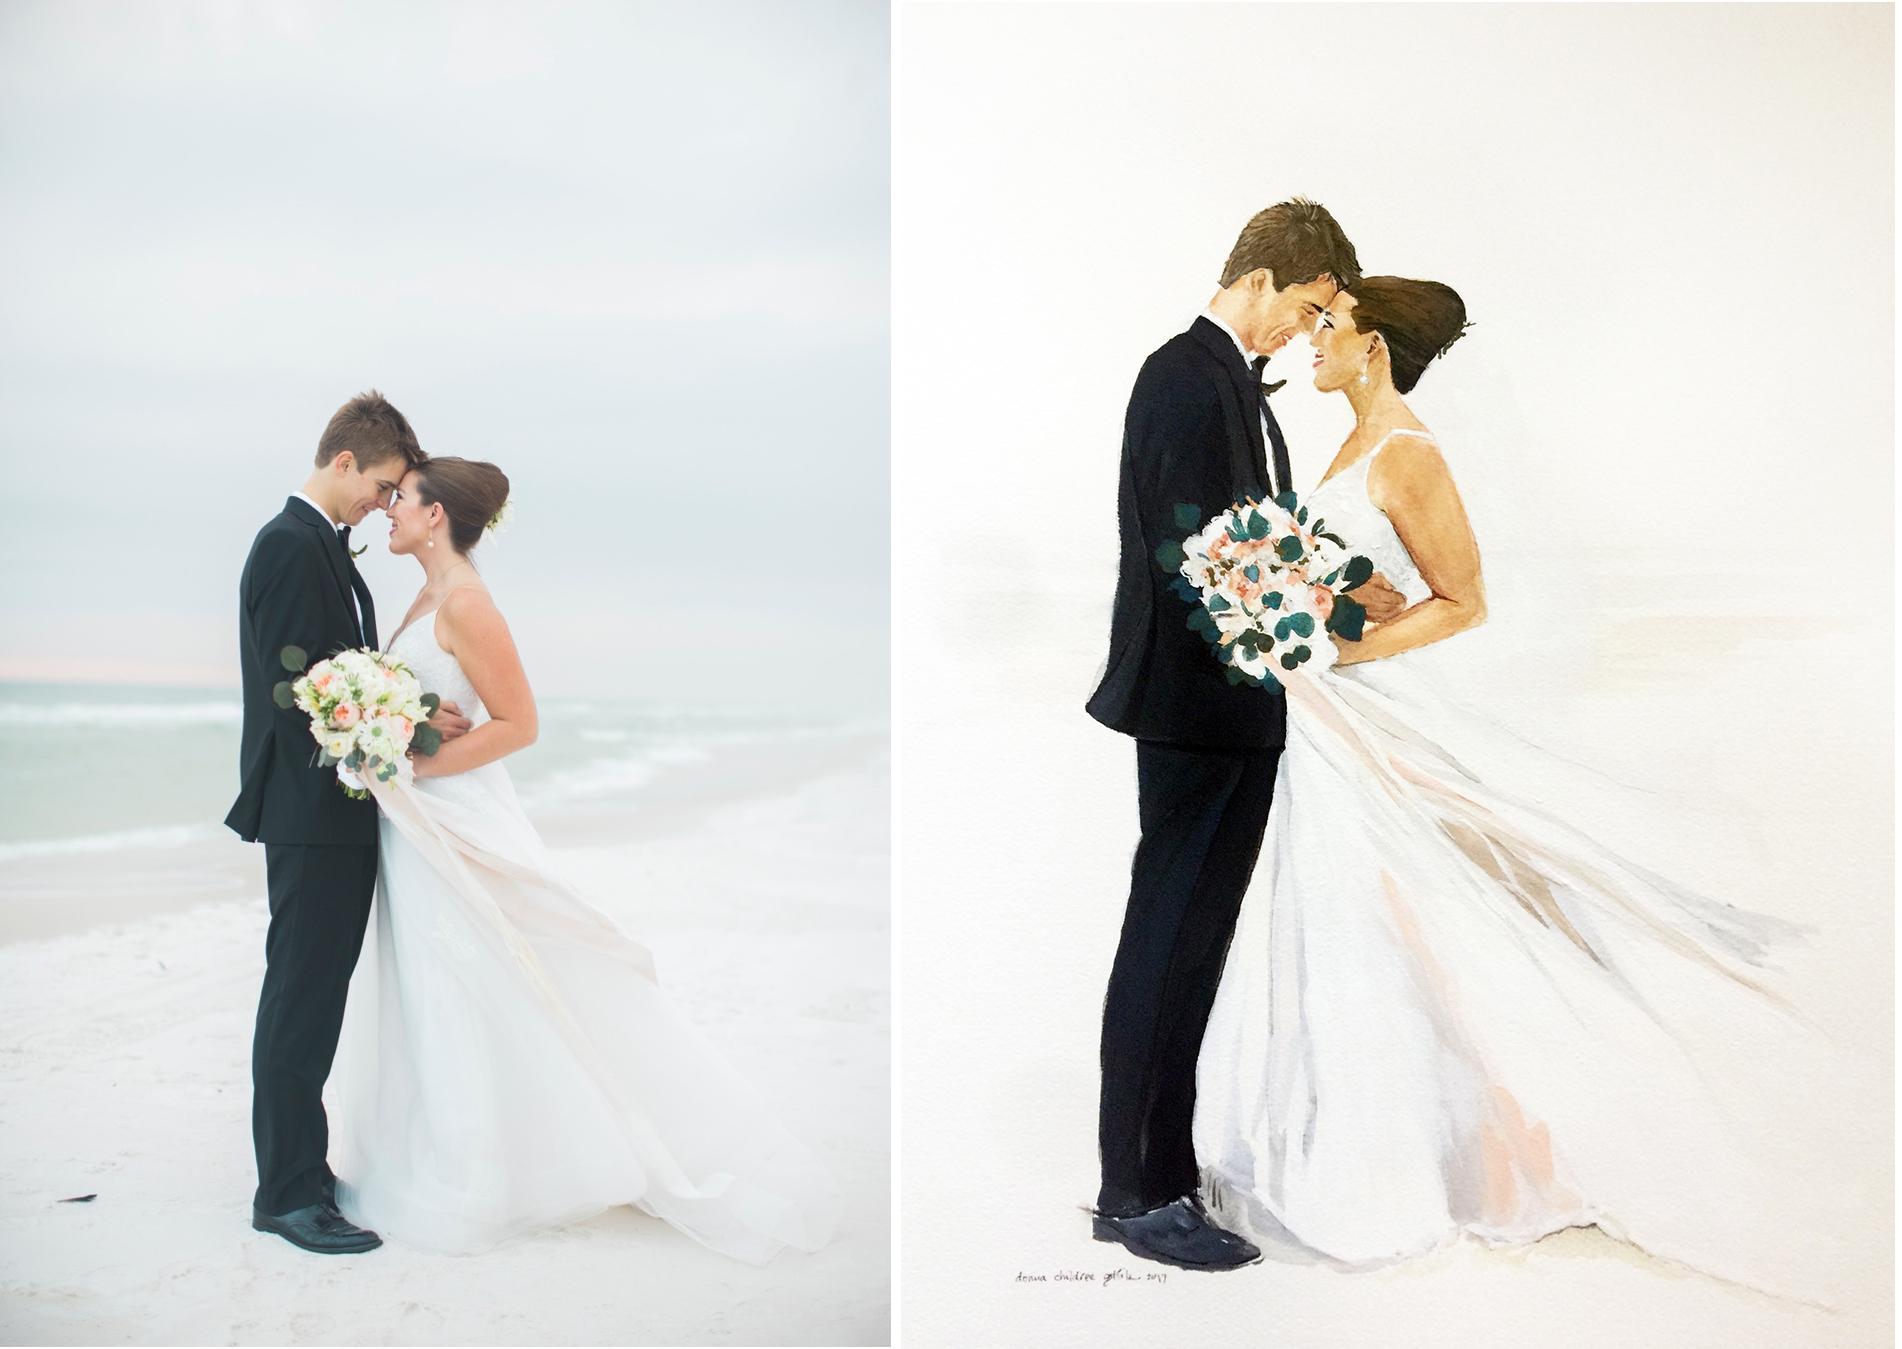 Seaside Vows, original photo and portrait